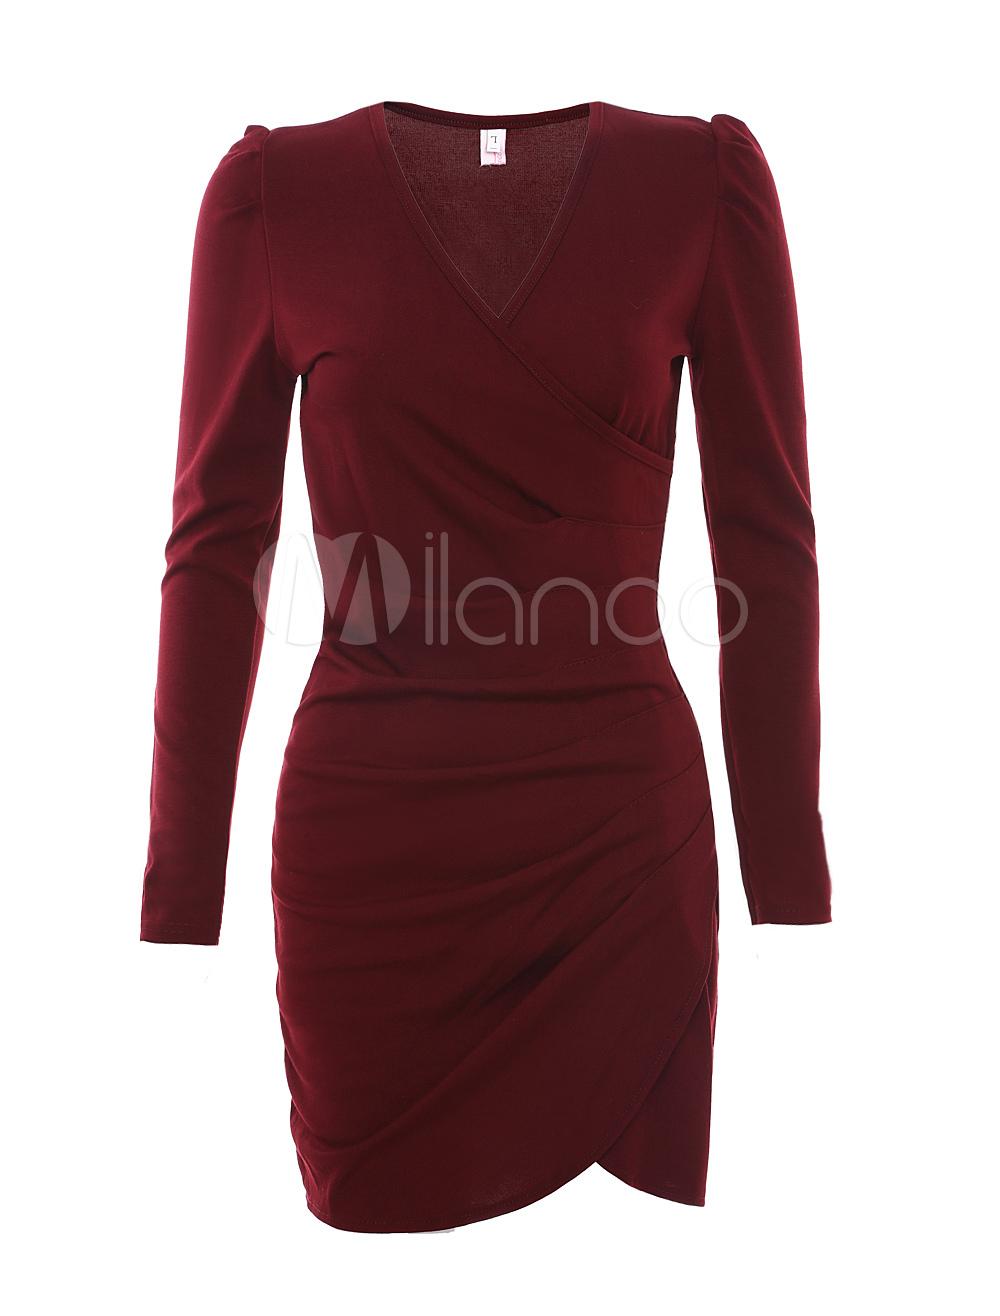 Burgundy Cotton Wrap Bodycon Dress for Woman